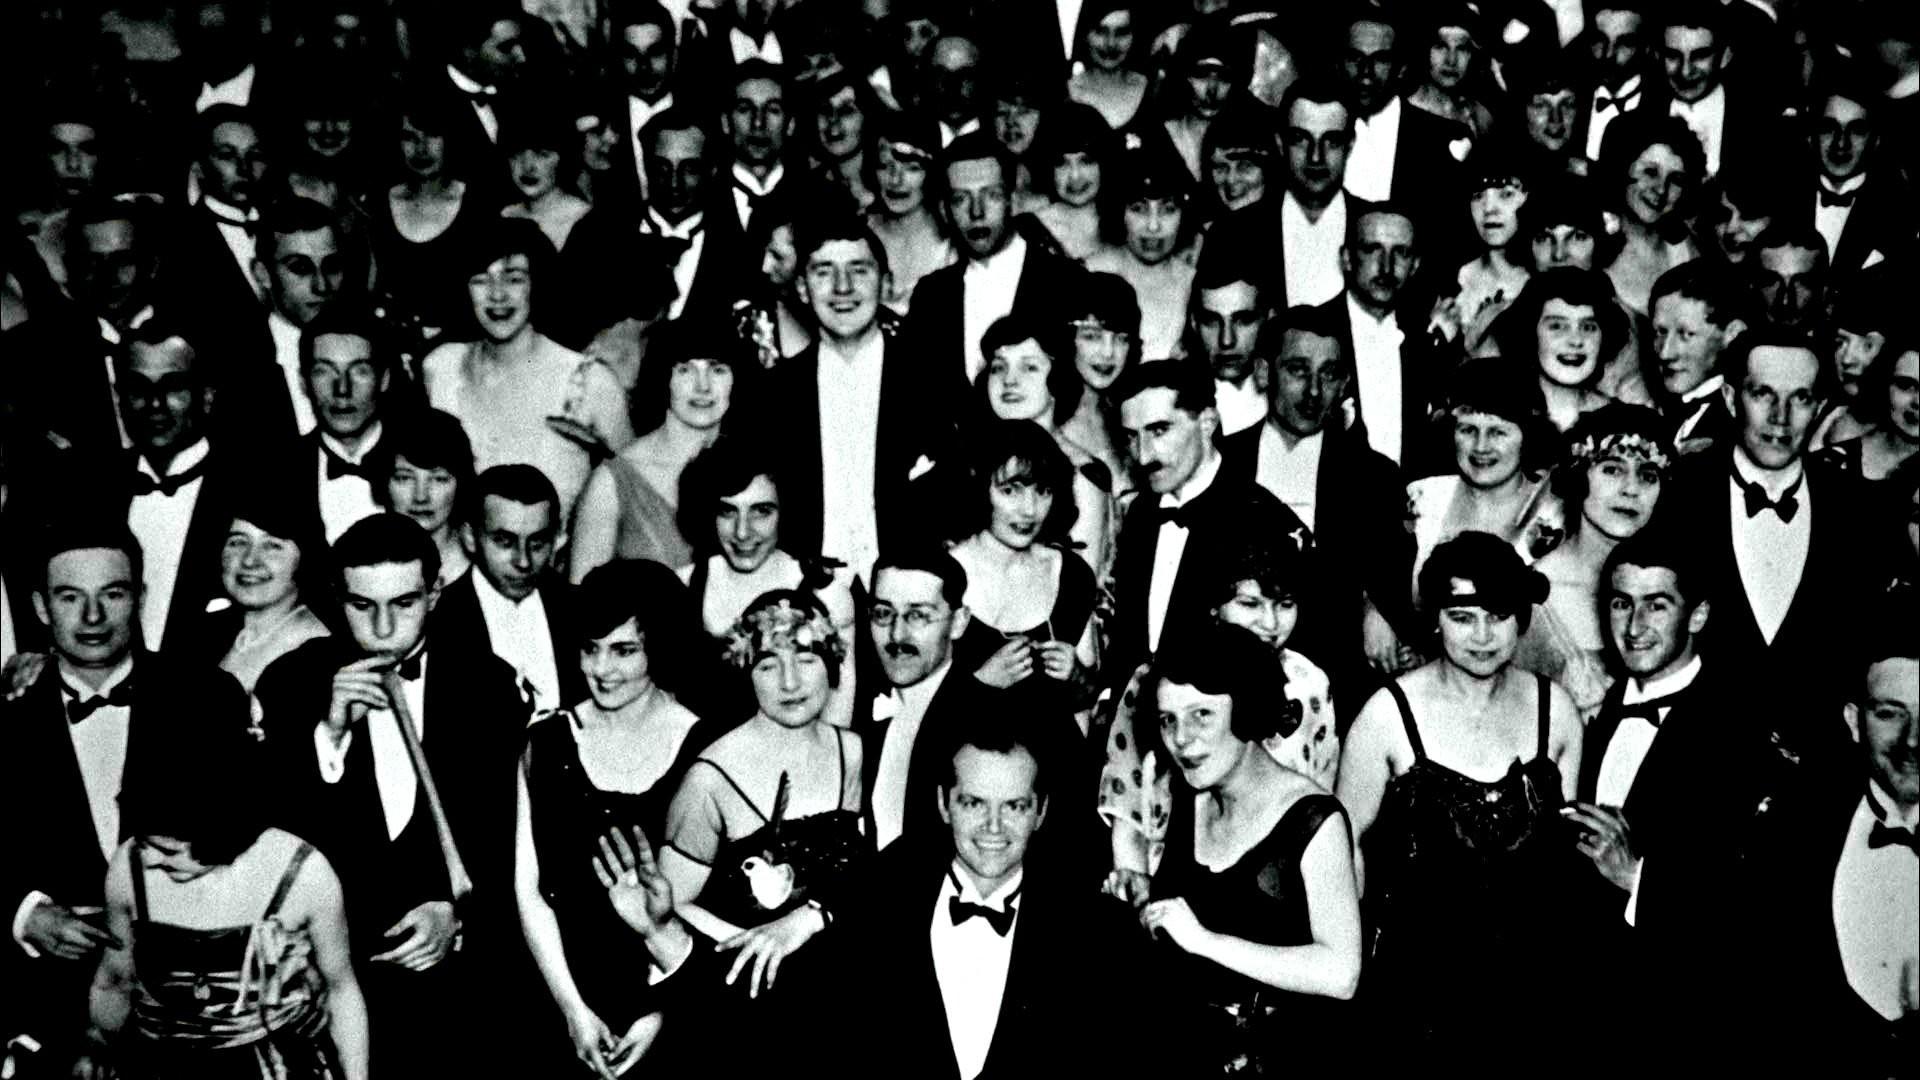 THE SHINING horror thriller dark movie film classic crowd death ghost dead  wallpaper | | 253370 | WallpaperUP